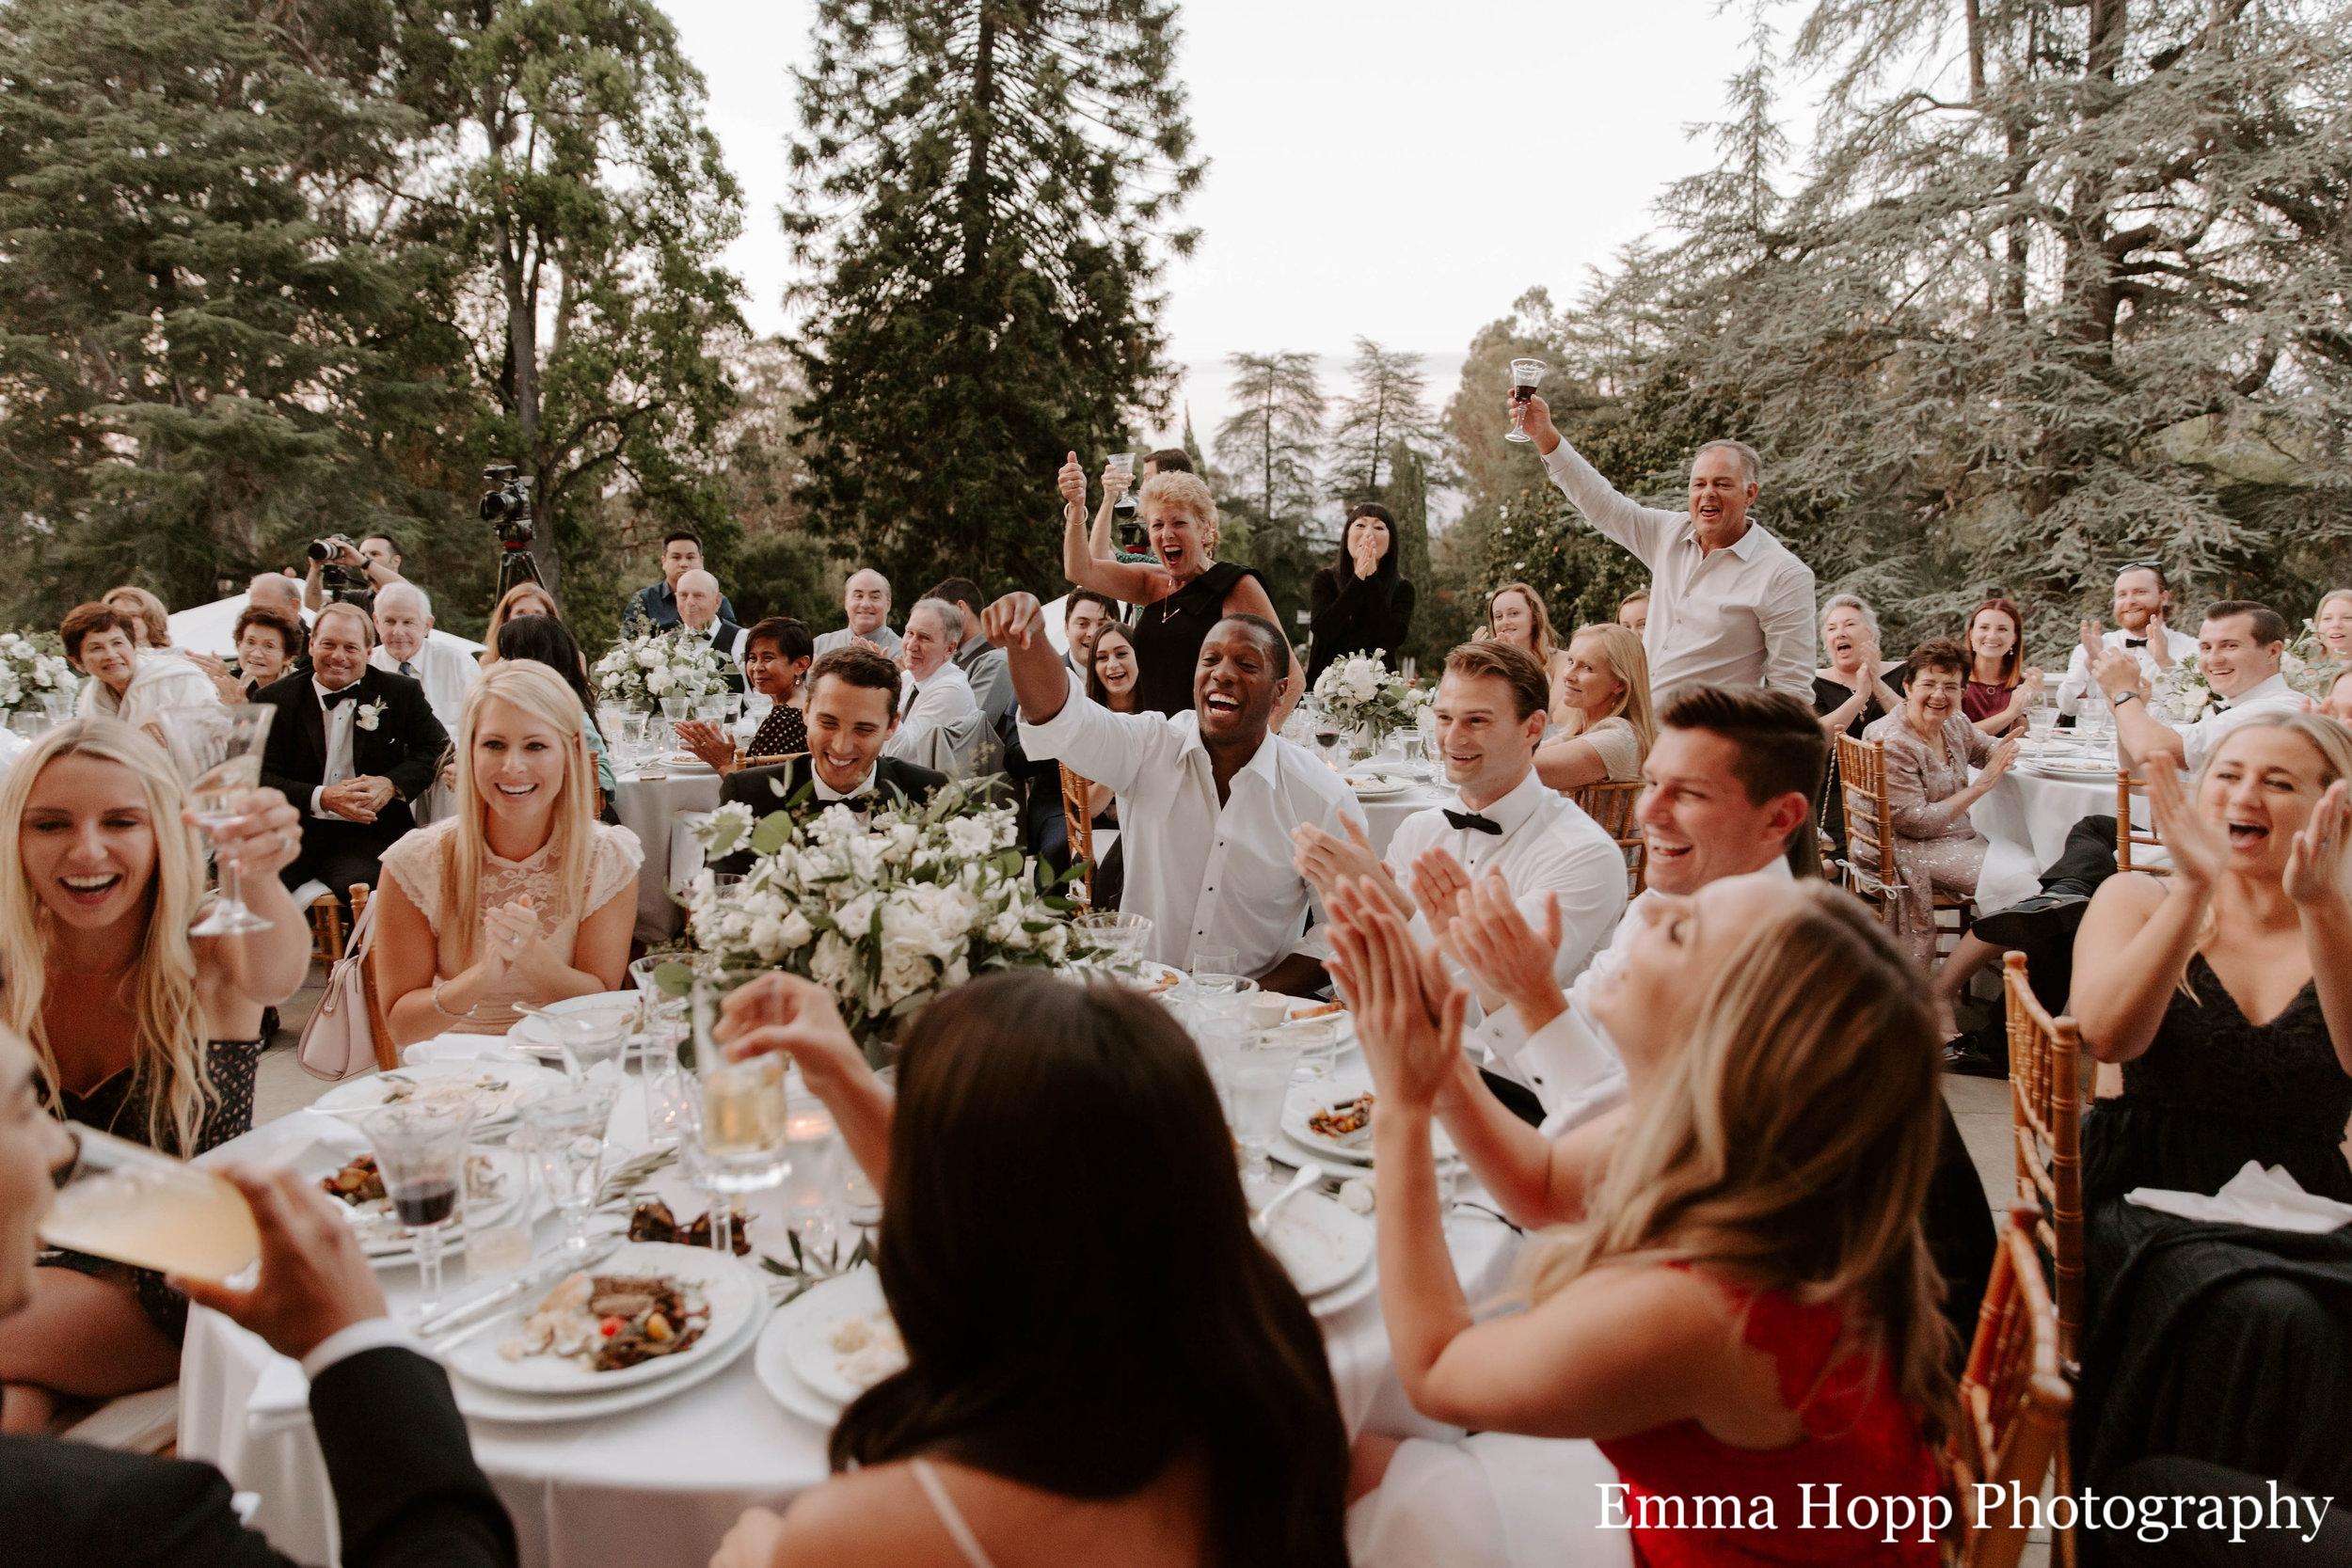 Los Gatos DJ - Lindsay & Michael Toasts and Speeches - Villa Montalvo Wedding - 0A8A1980 - Emma Hopp Photography.jpg